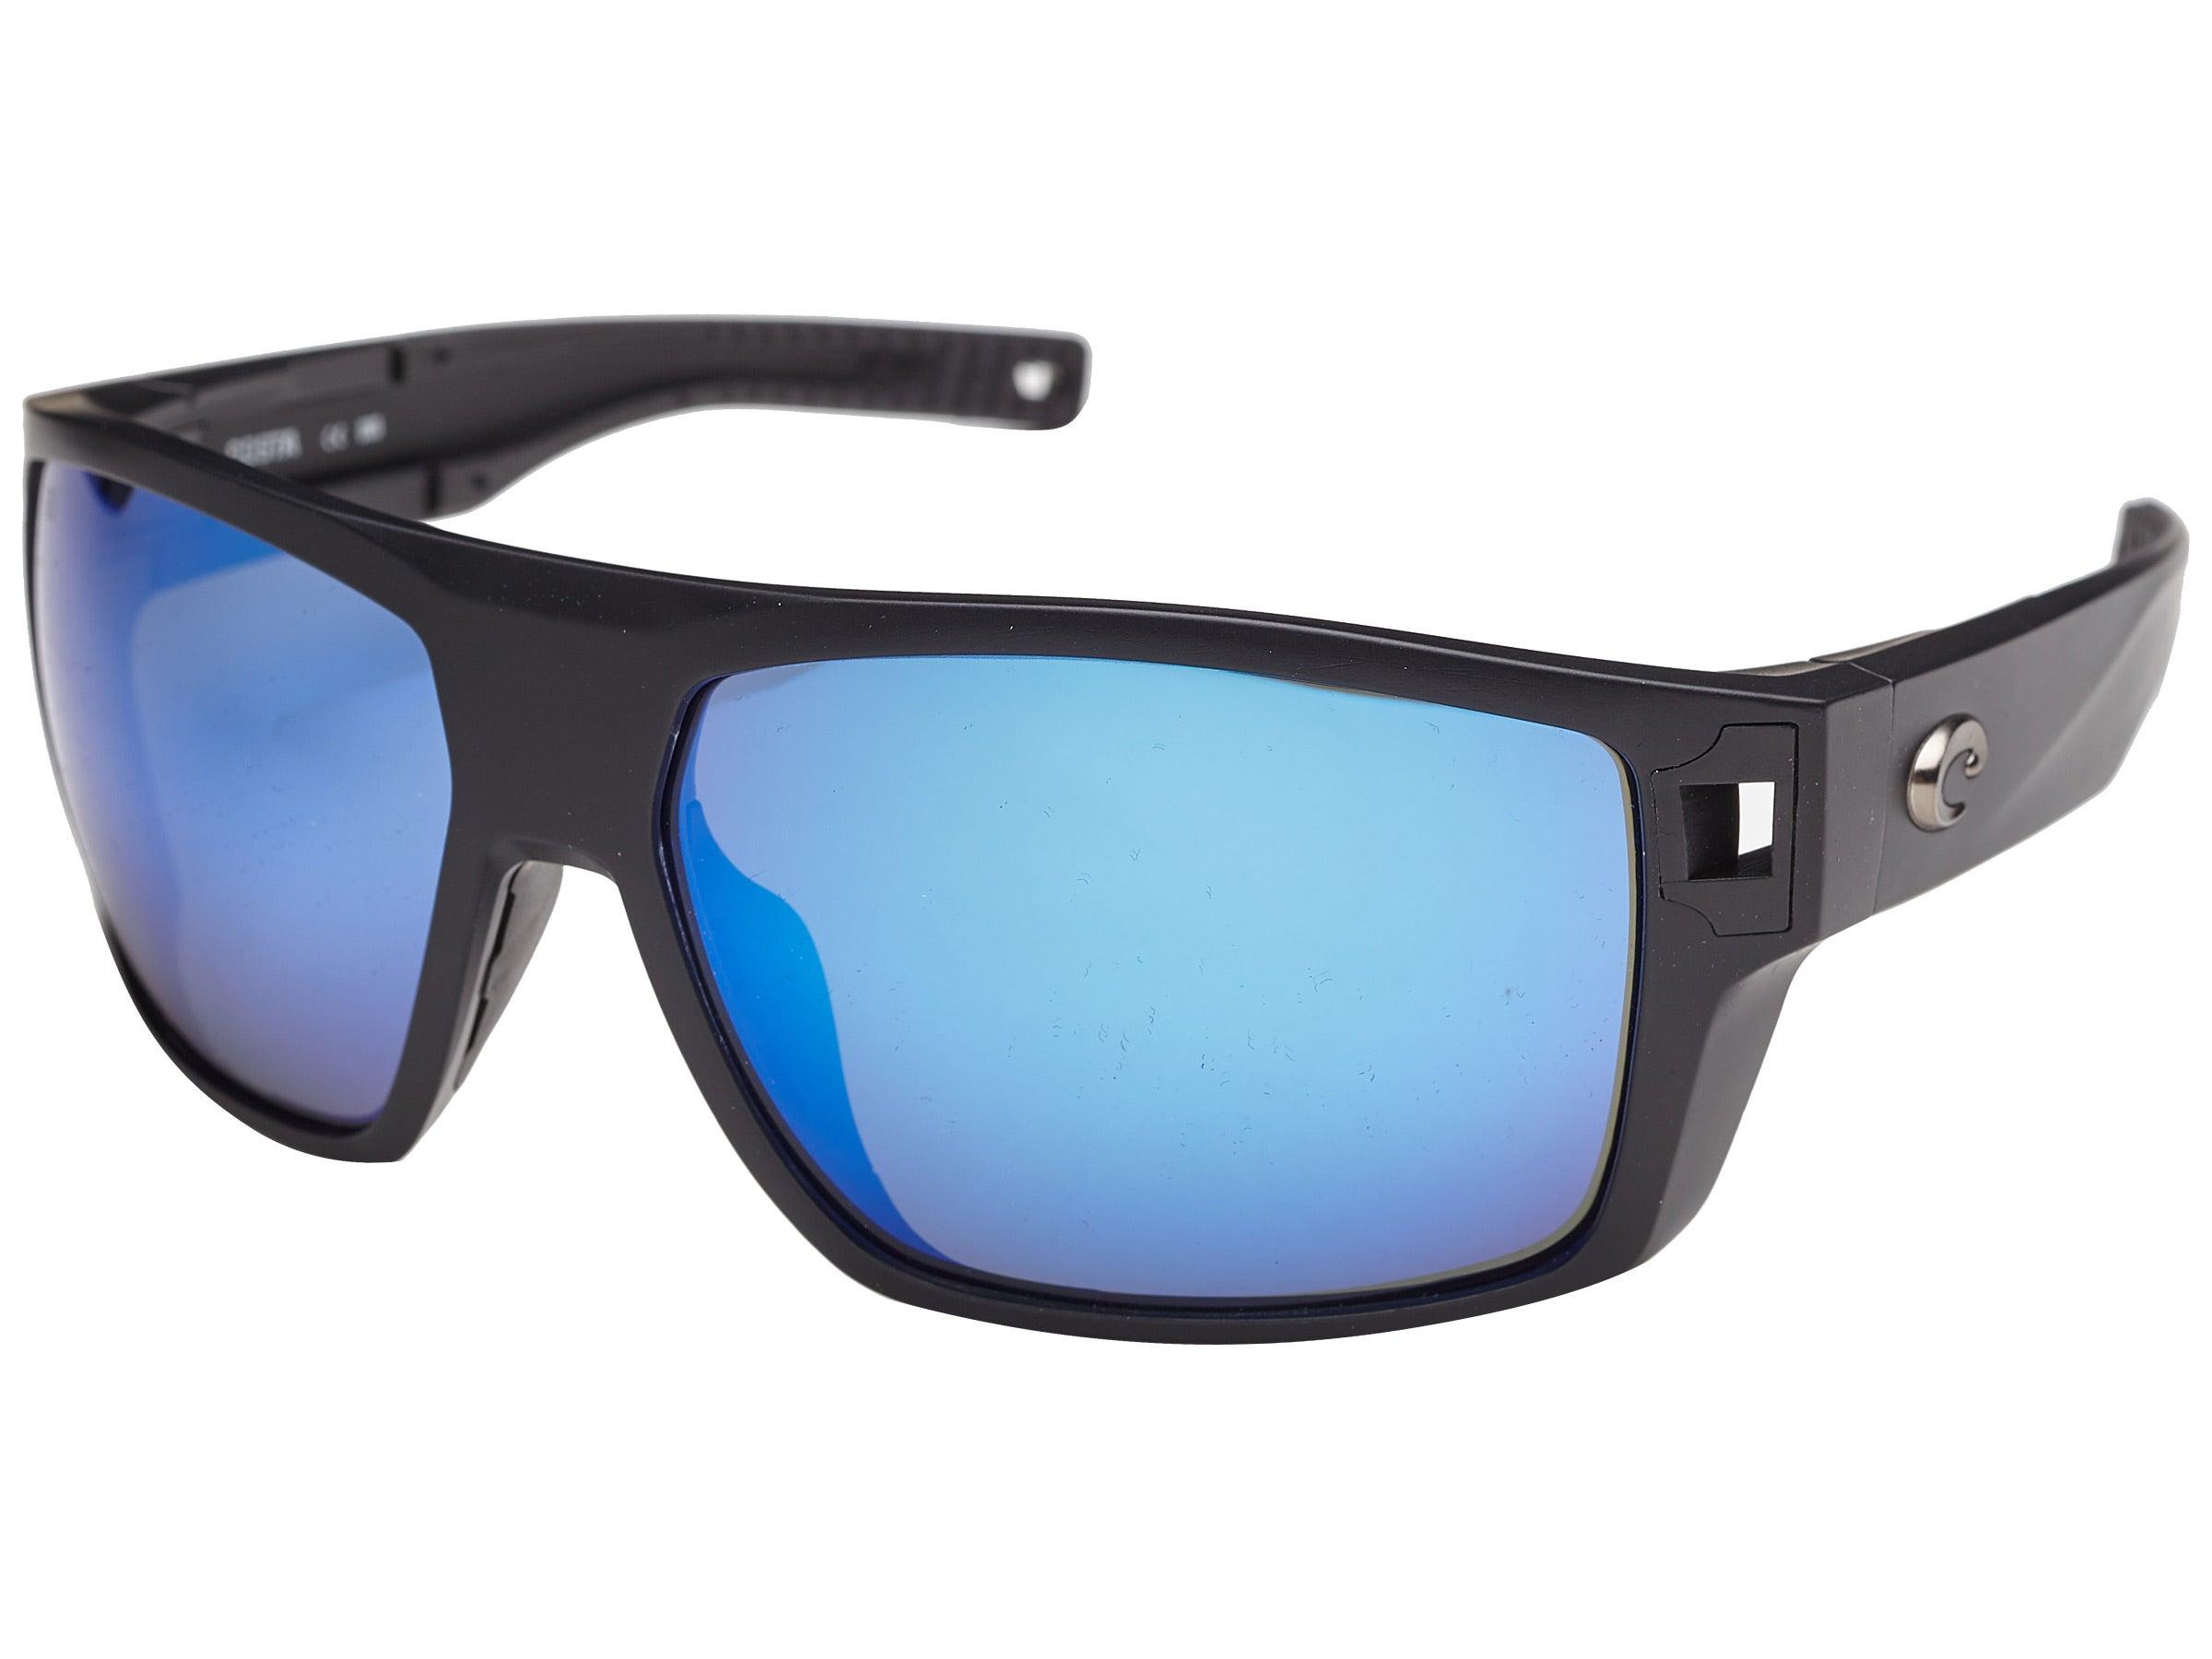 Costa Diego Sunglasses Matte Black//Blue Mirror 580G Polarized Glass Lenses